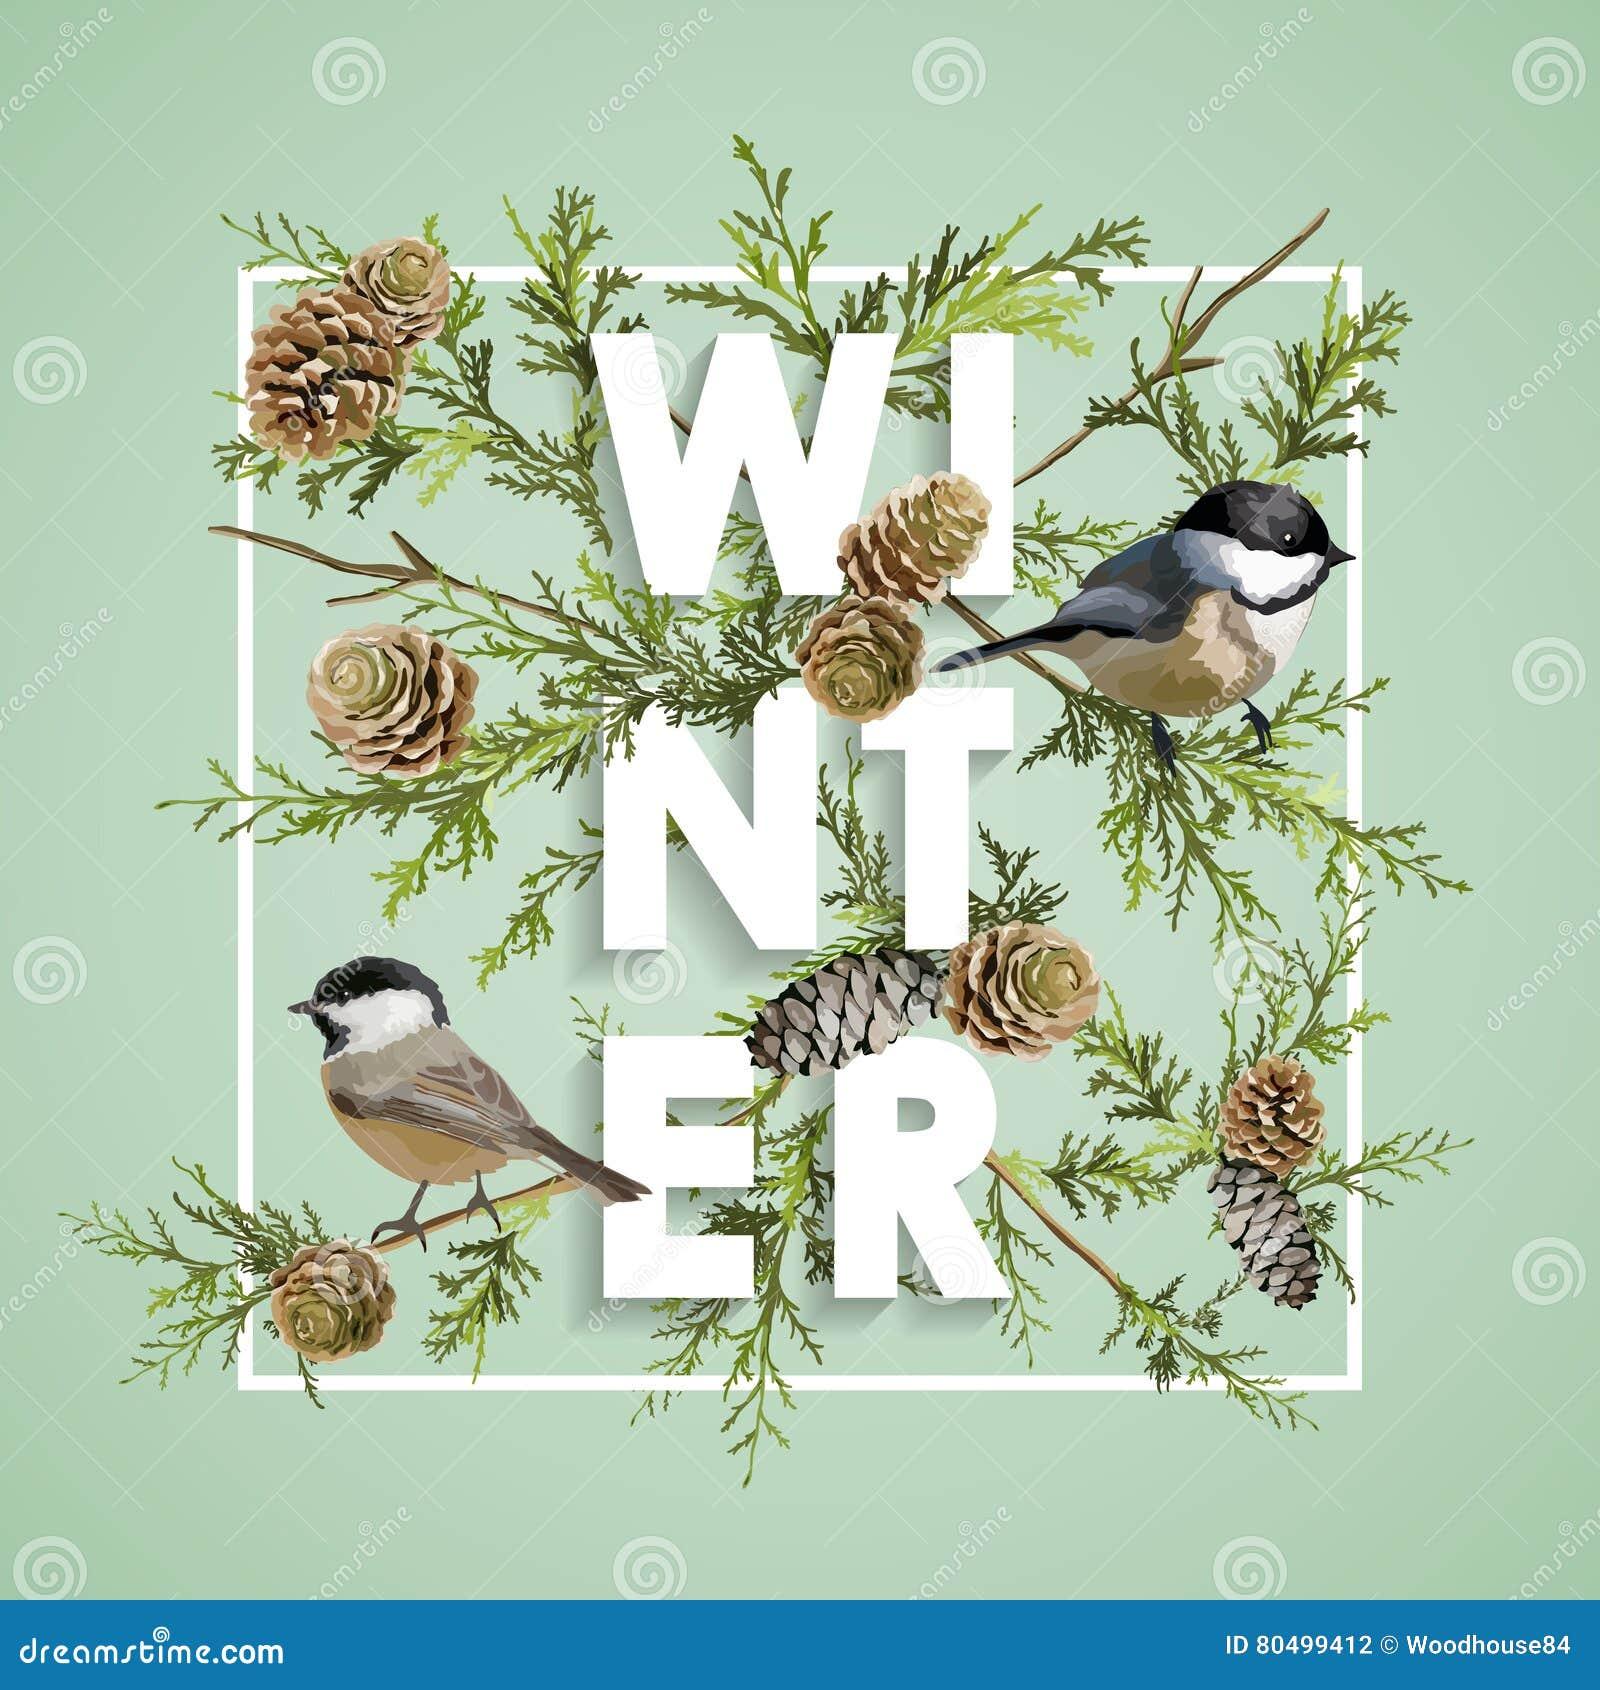 Winter Christmas Design in Vector. Winter Birds with Pines